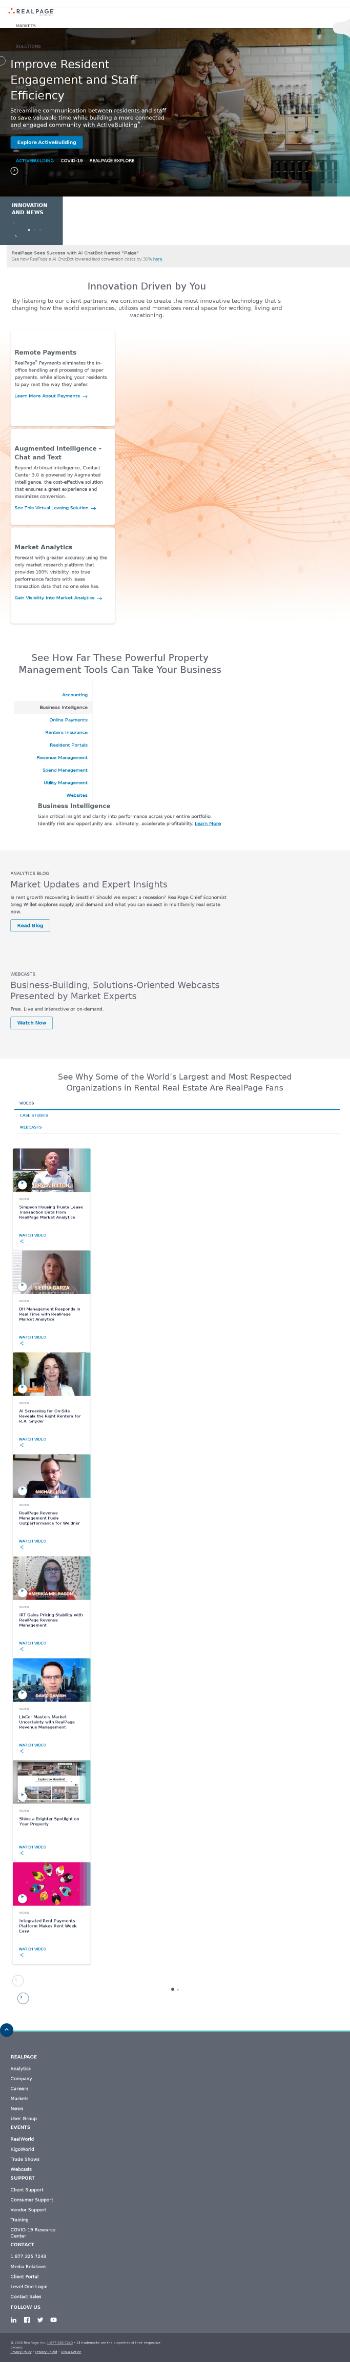 RealPage, Inc. Website Screenshot